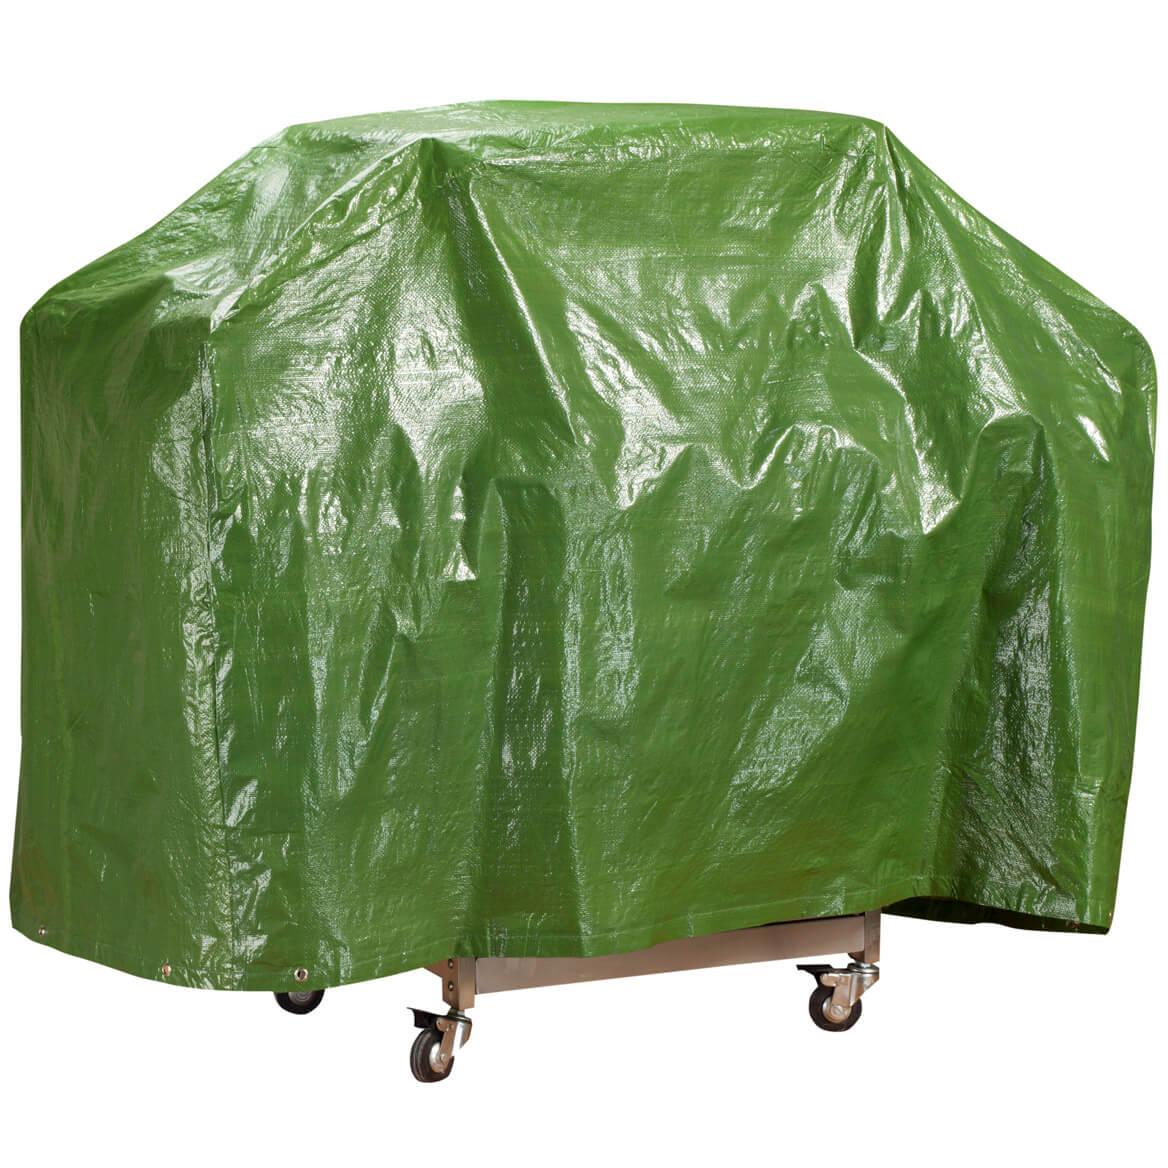 "Wagon Grill Cover, 60""L x 42""H x 22""W-358357"